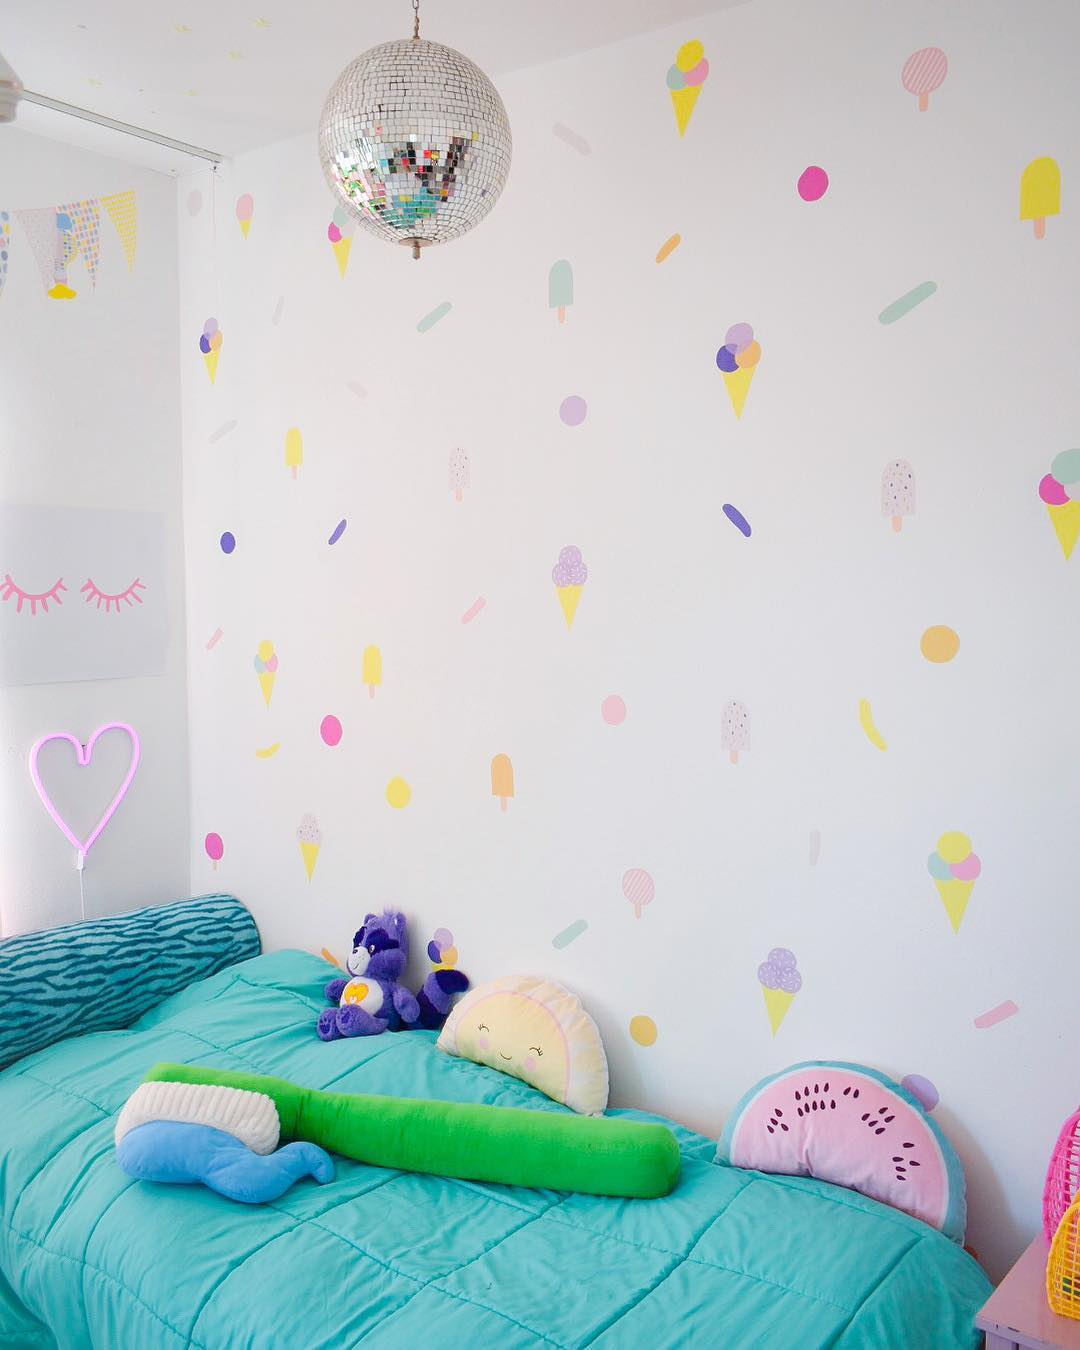 Swanky Summer Pop Wallpaper Stickers For Kids Room